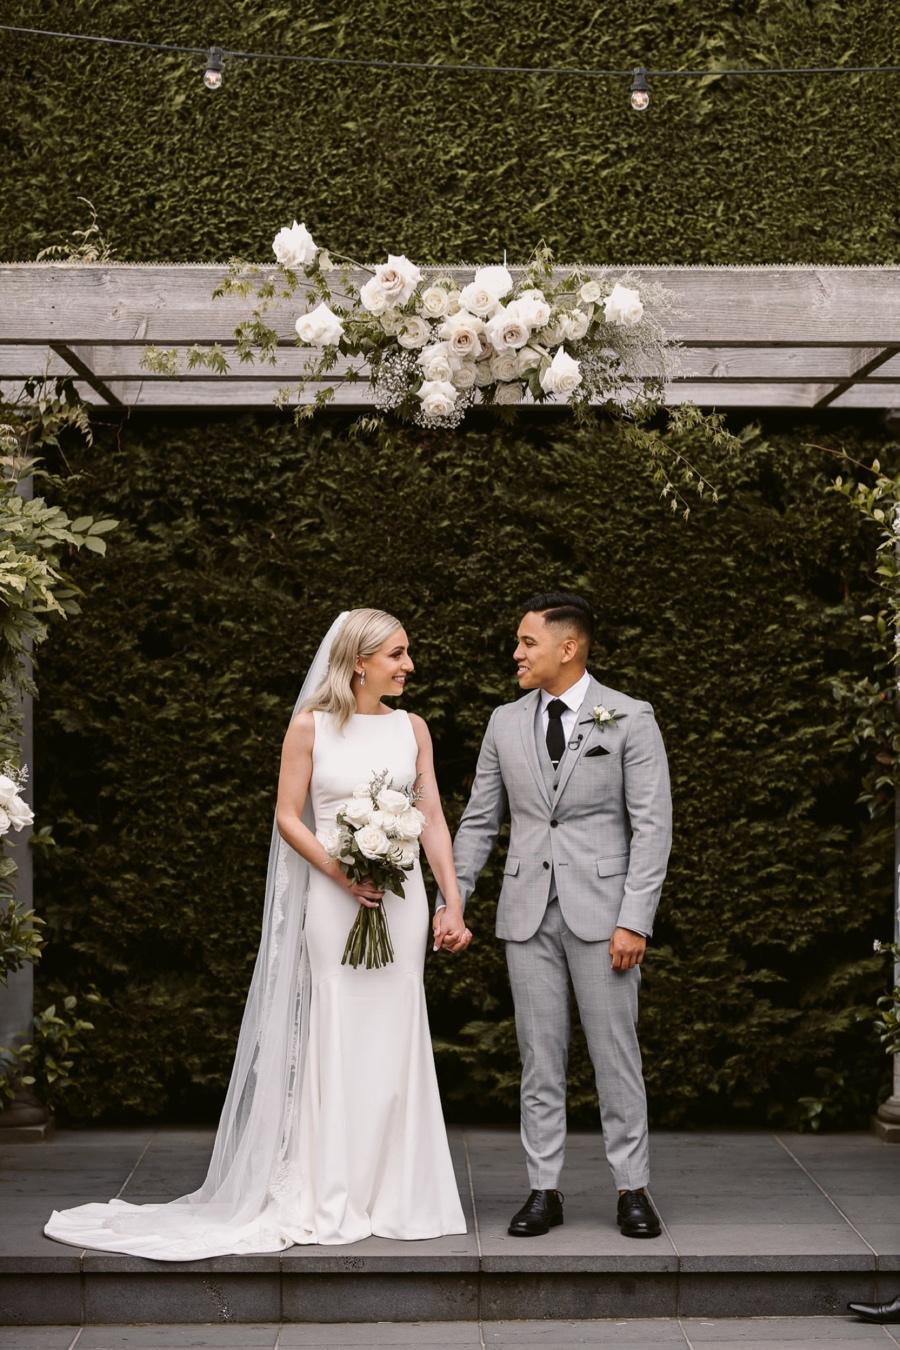 Quat Quatta Melbourne Wedding Photography56.jpg